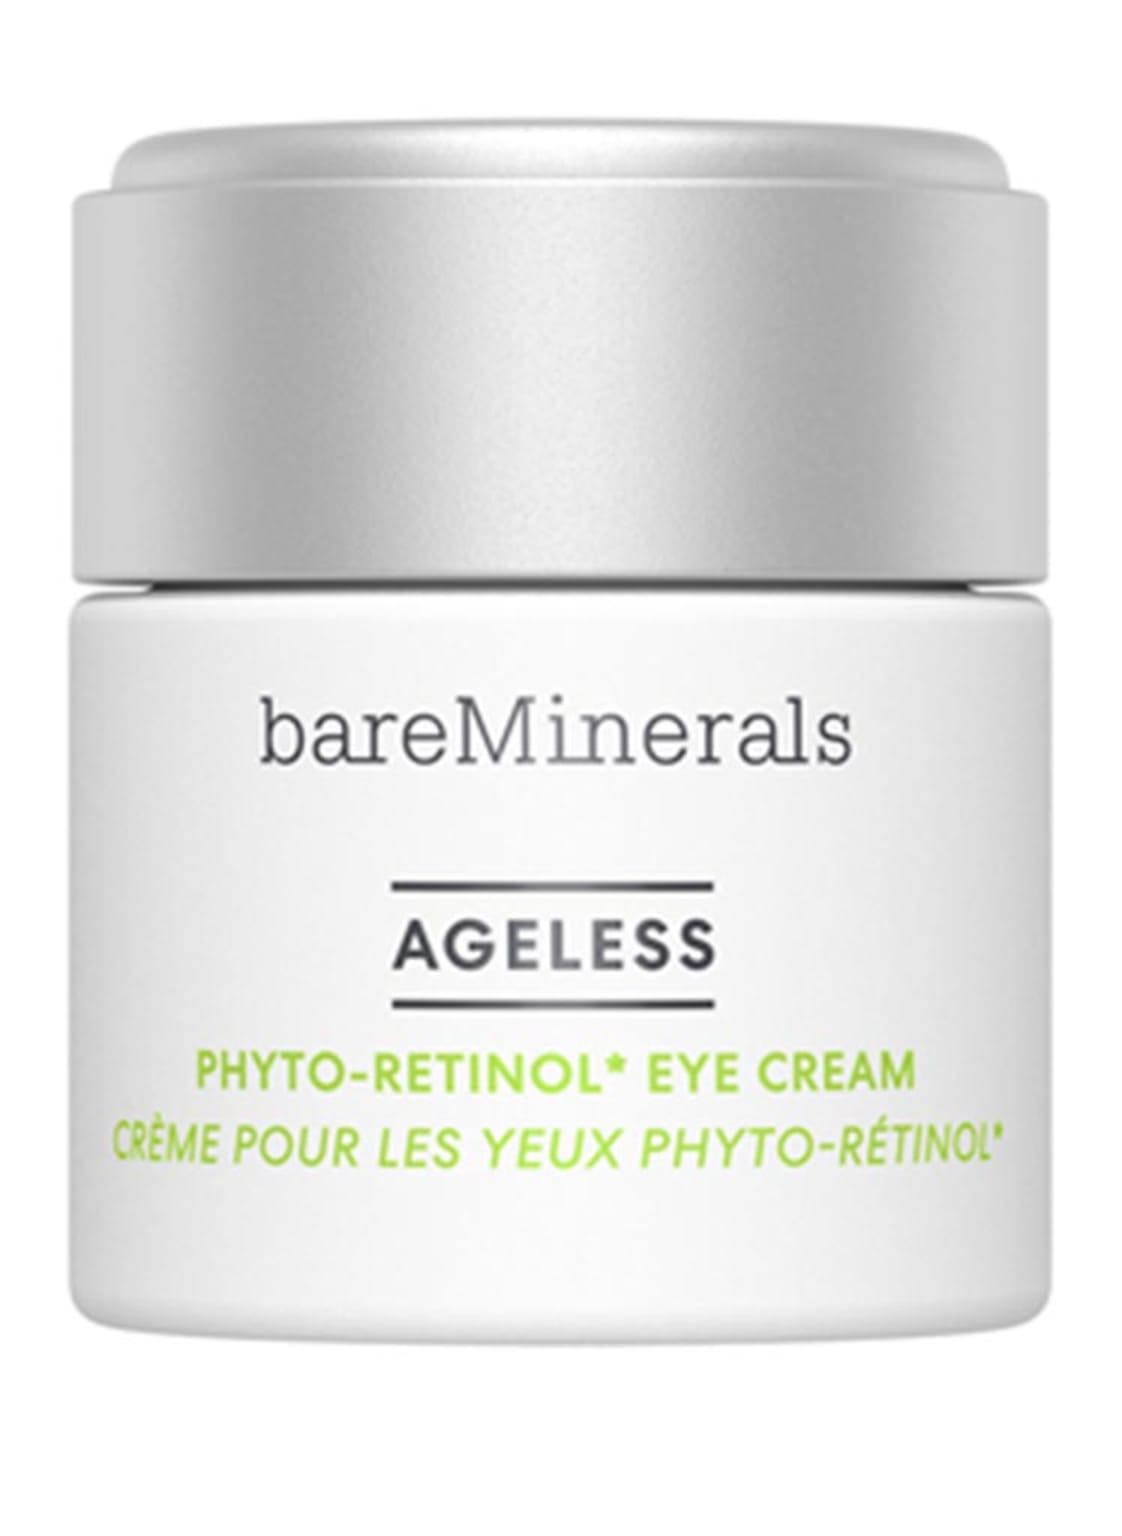 Image of Bareminerals Ageless Phyto-Retinol Eye Cream 15 gr